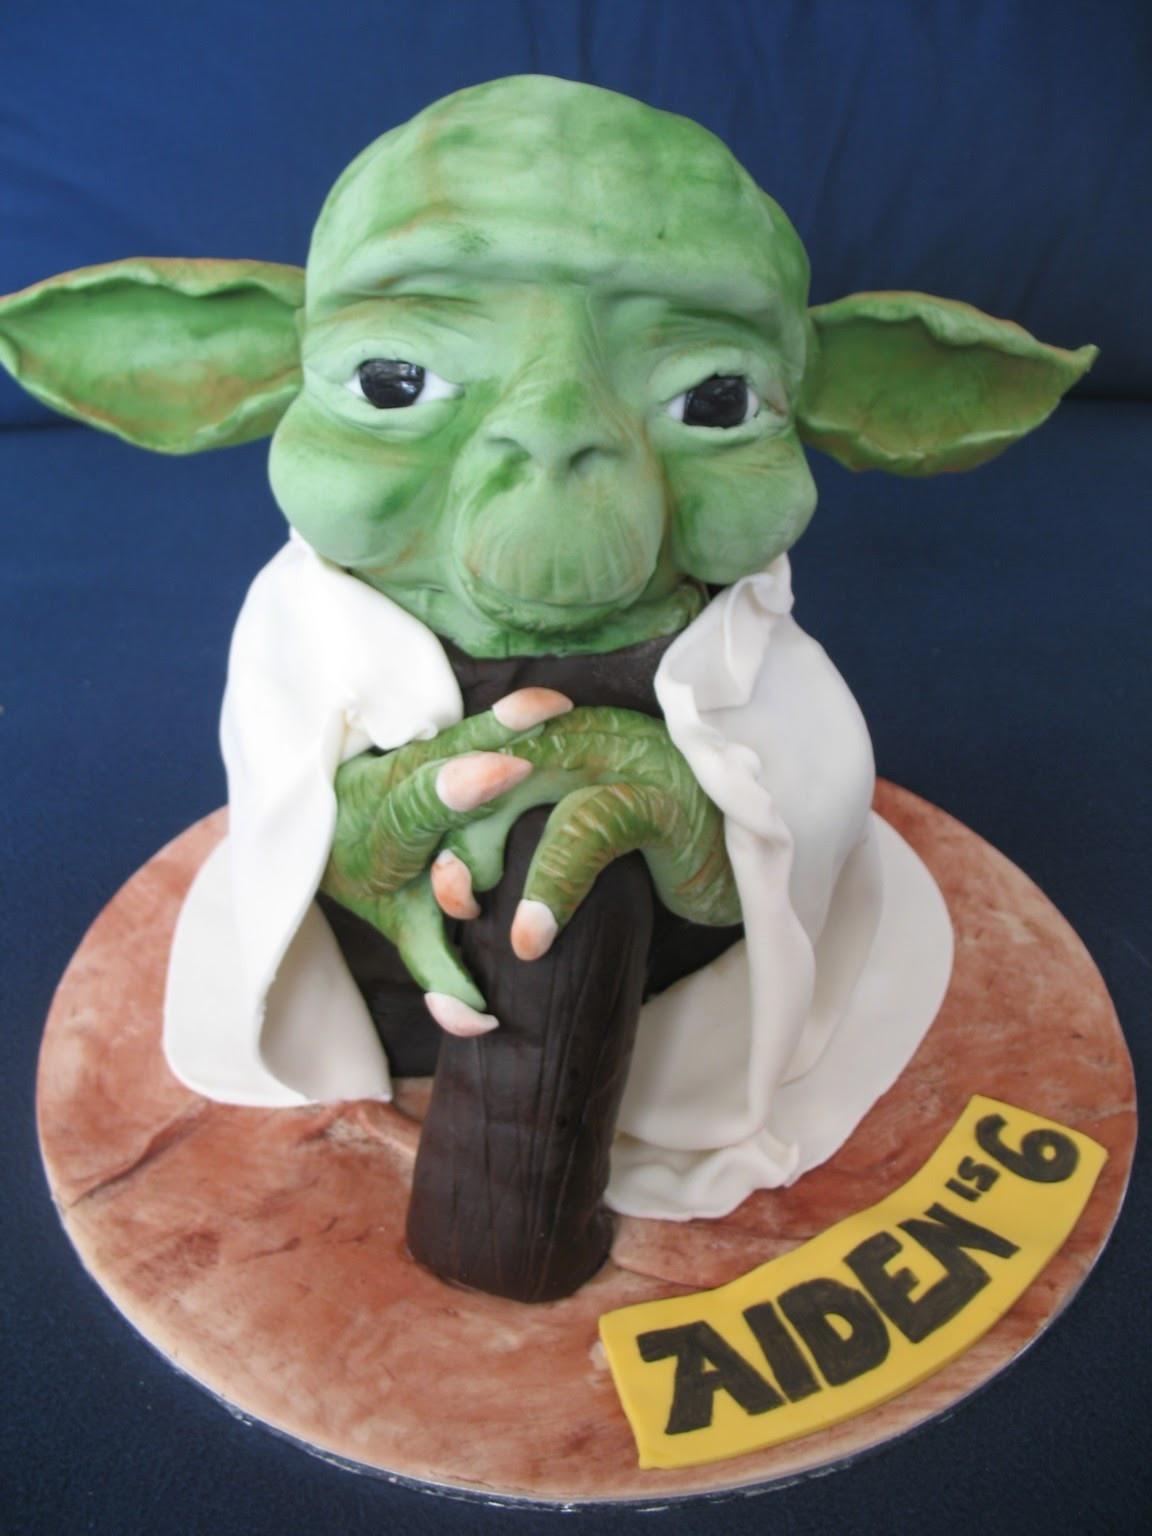 Yoda Birthday Cake  Blissfully Sweet A Yoda Birthday Cake for a Star Wars fan